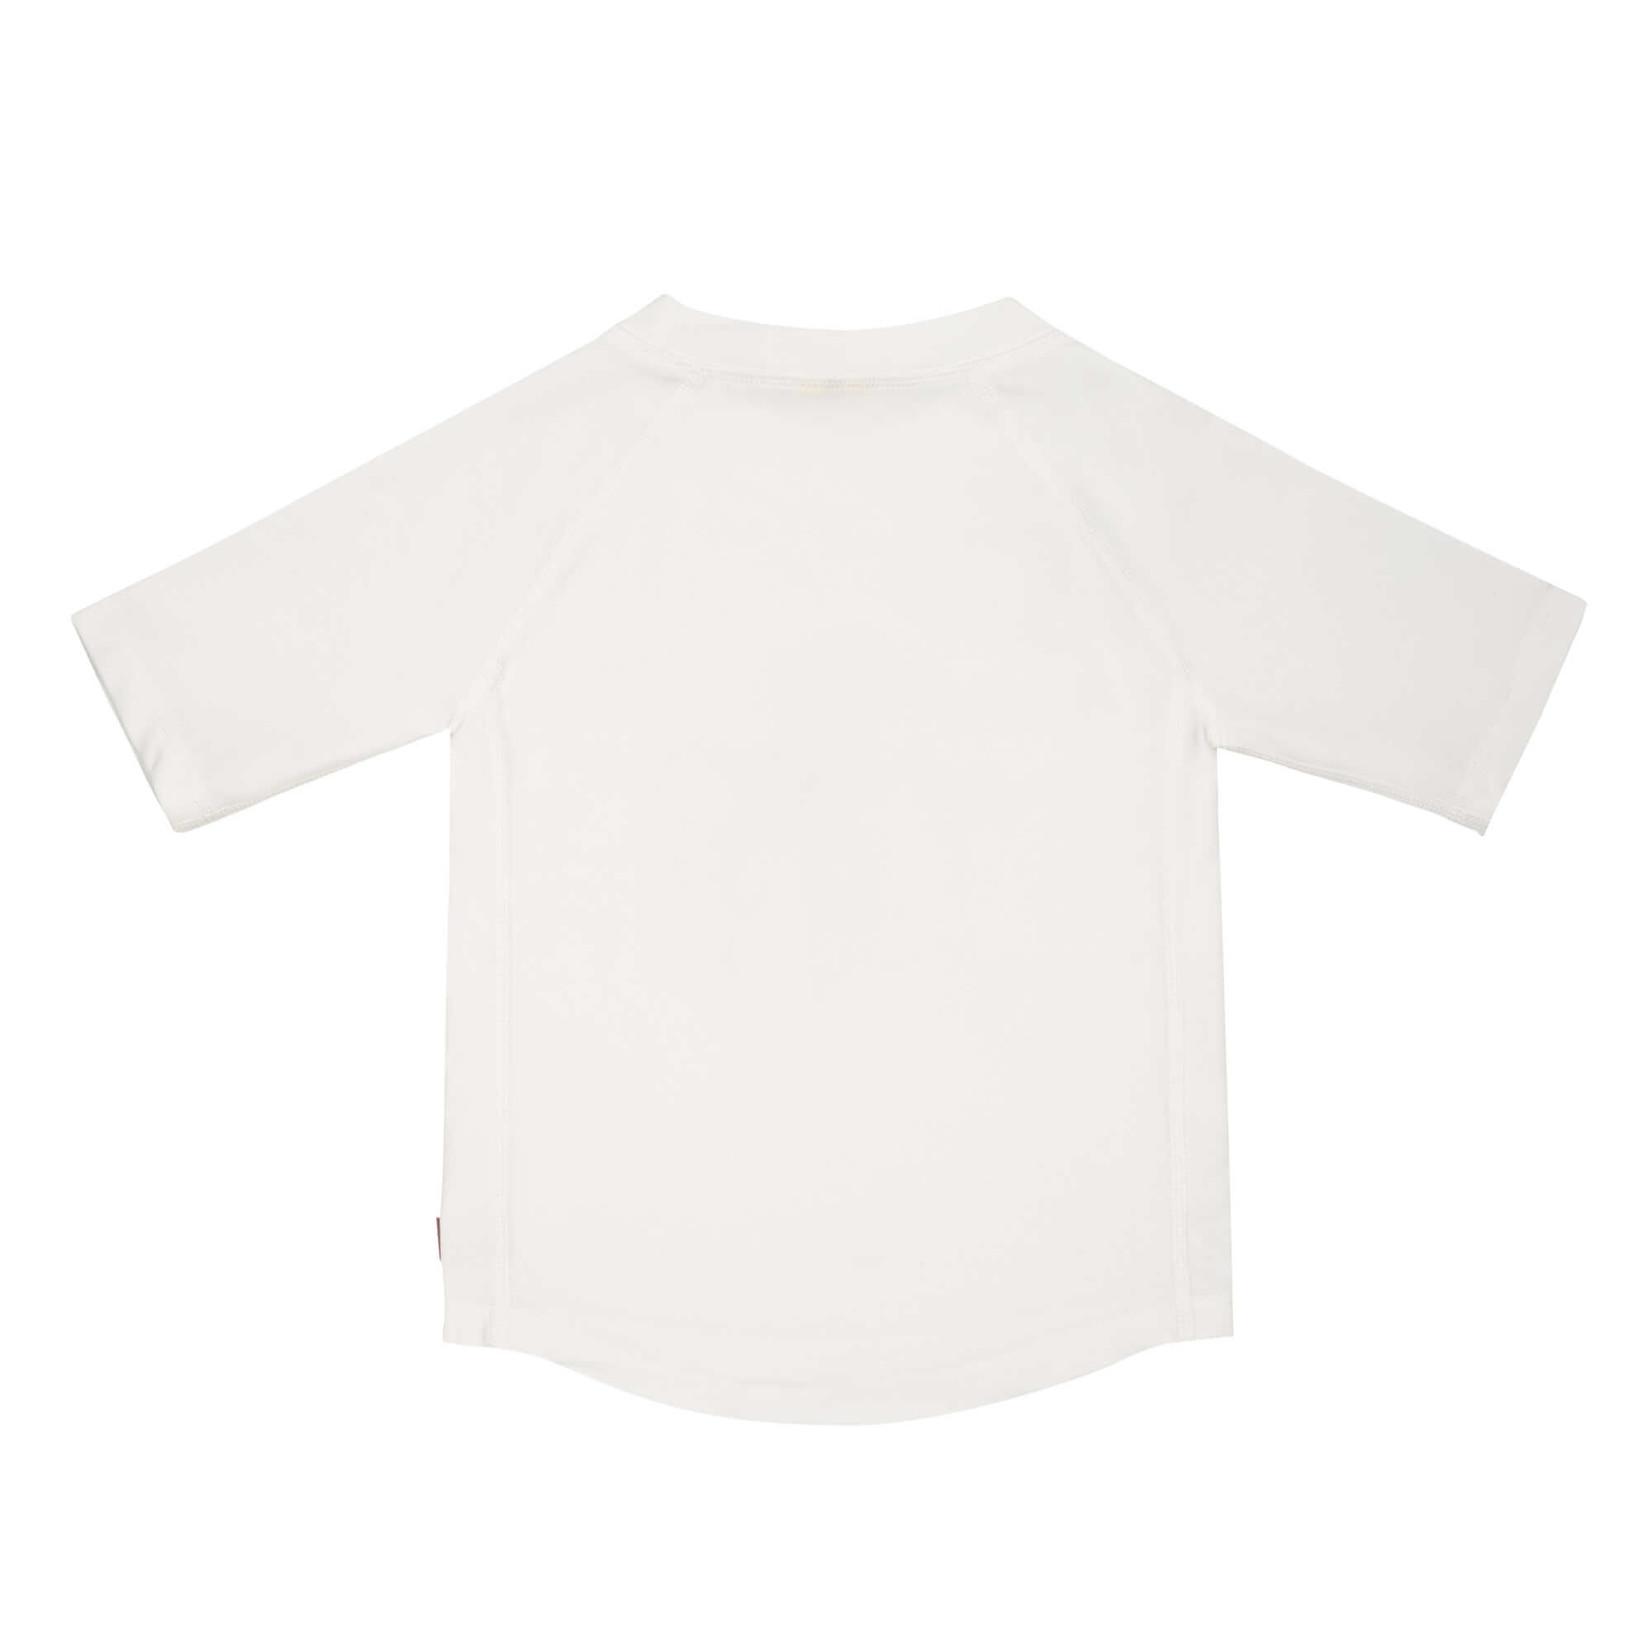 Lässig LSF Short Sleeve Rashguard  Ocupus White